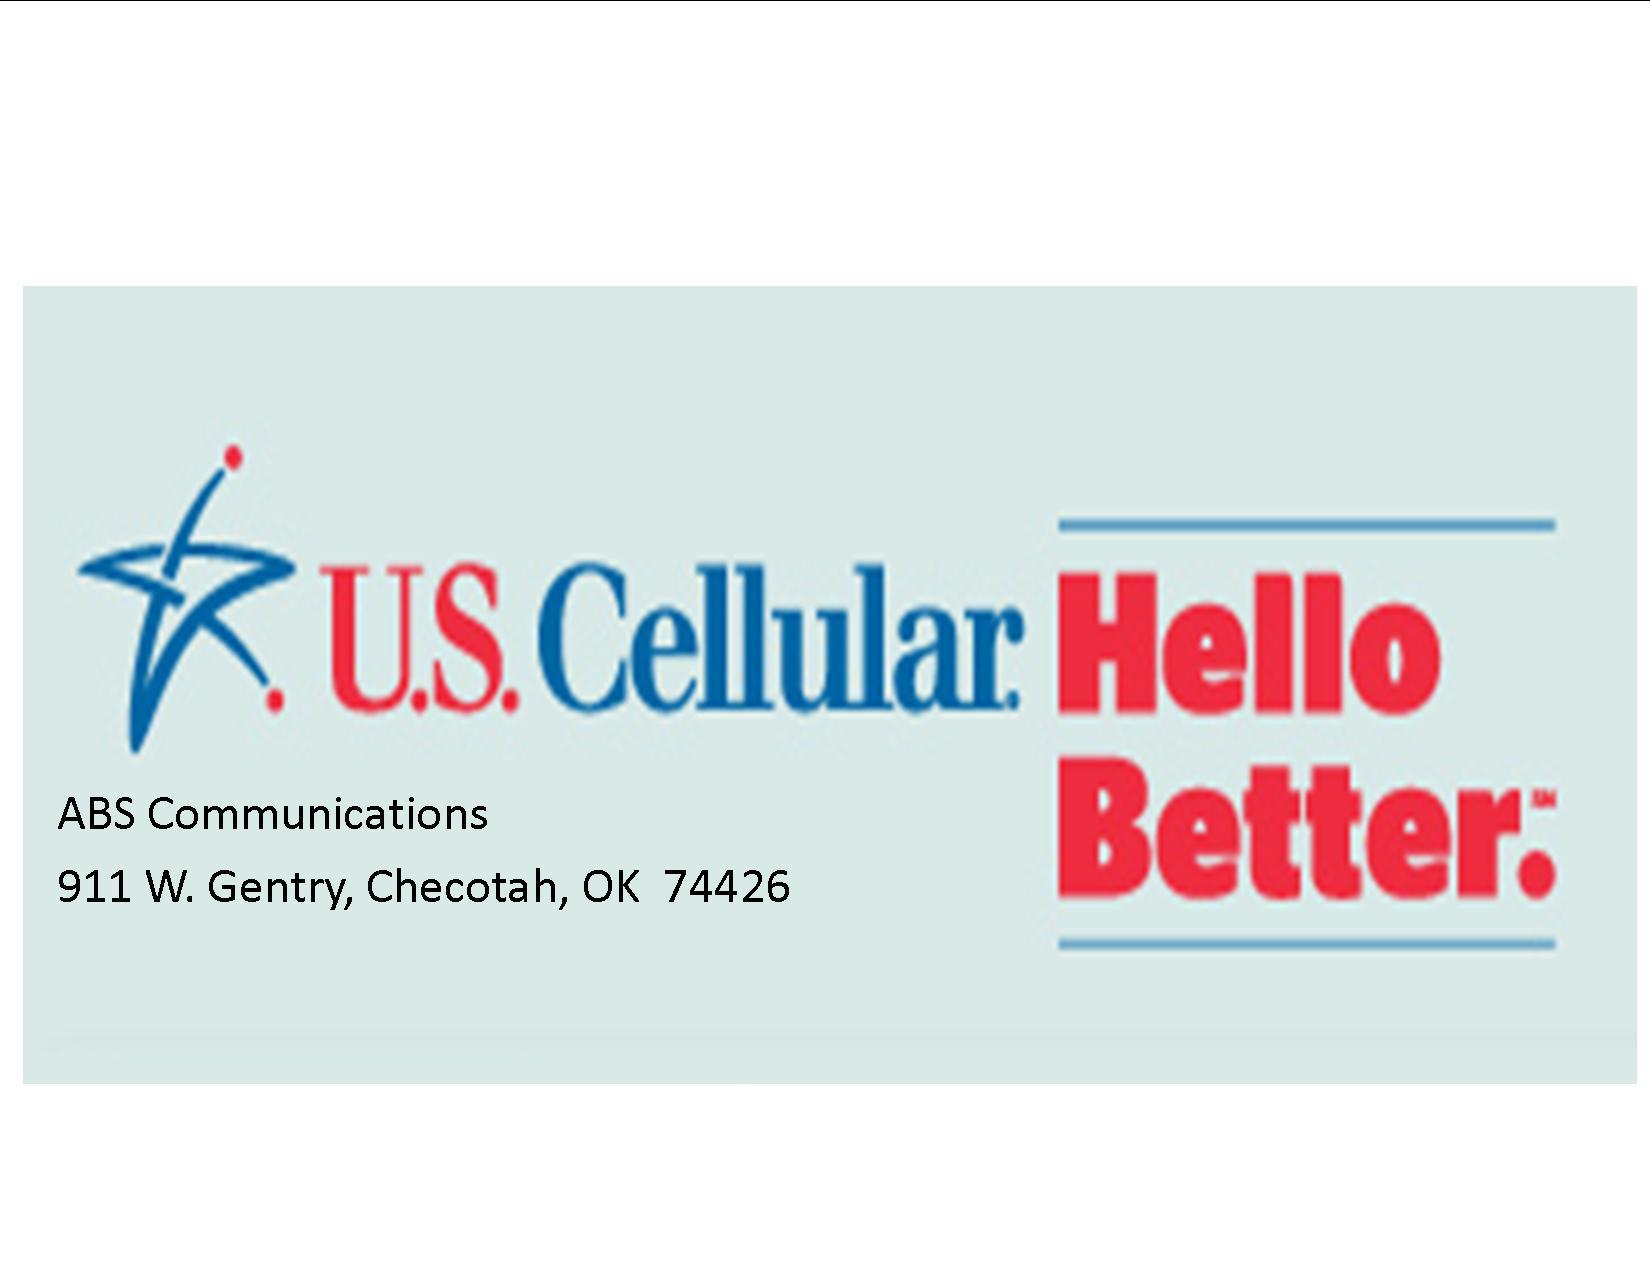 ABS_Communications_logo(2).jpg